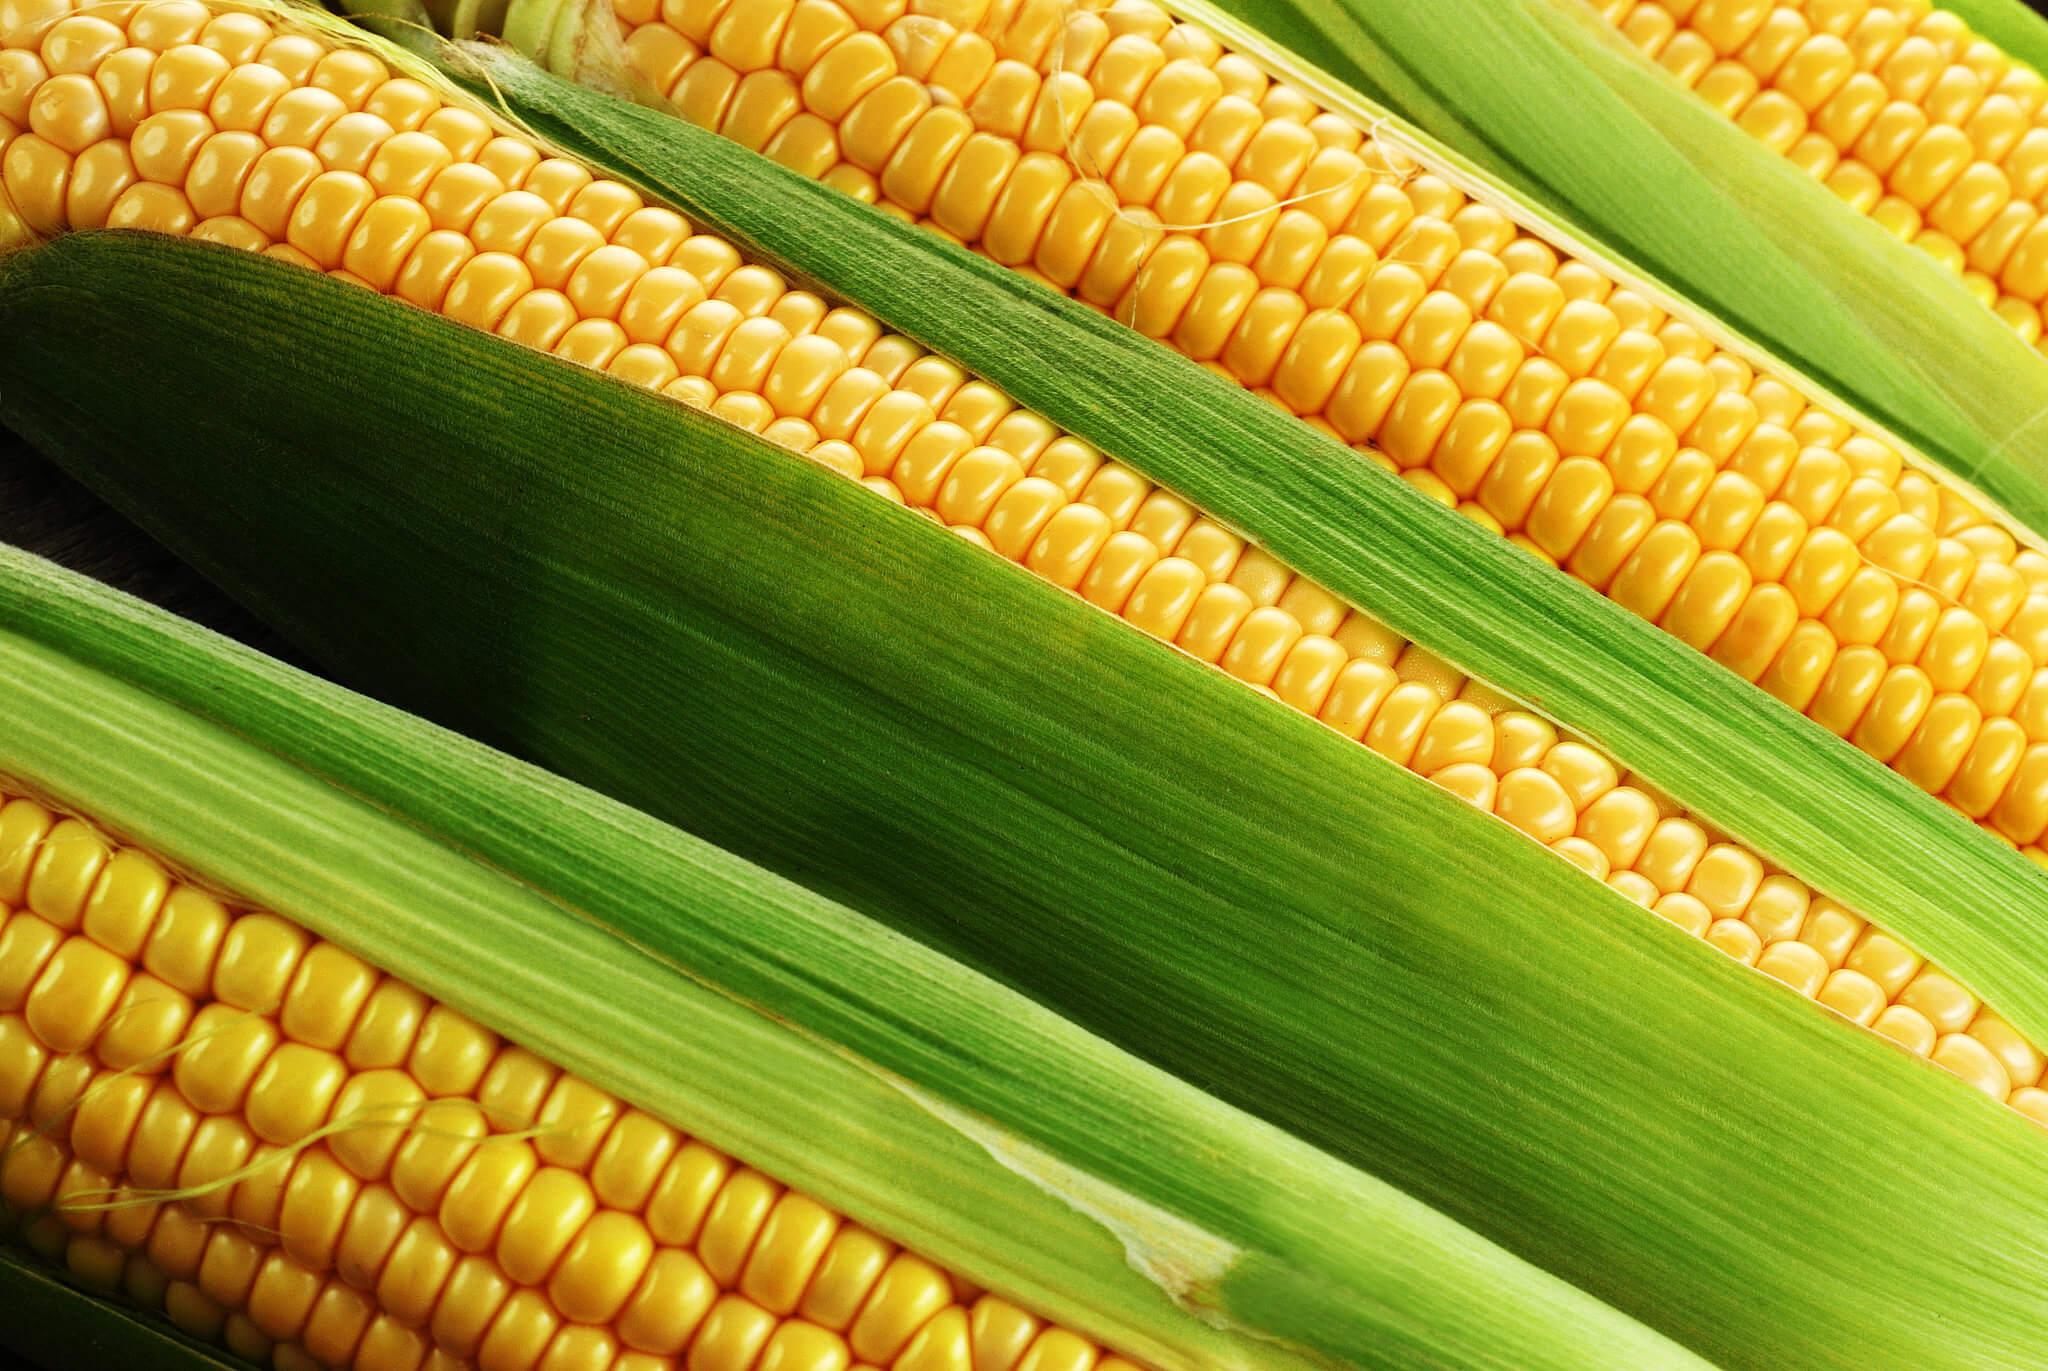 какую кукурузу подобрать для варки